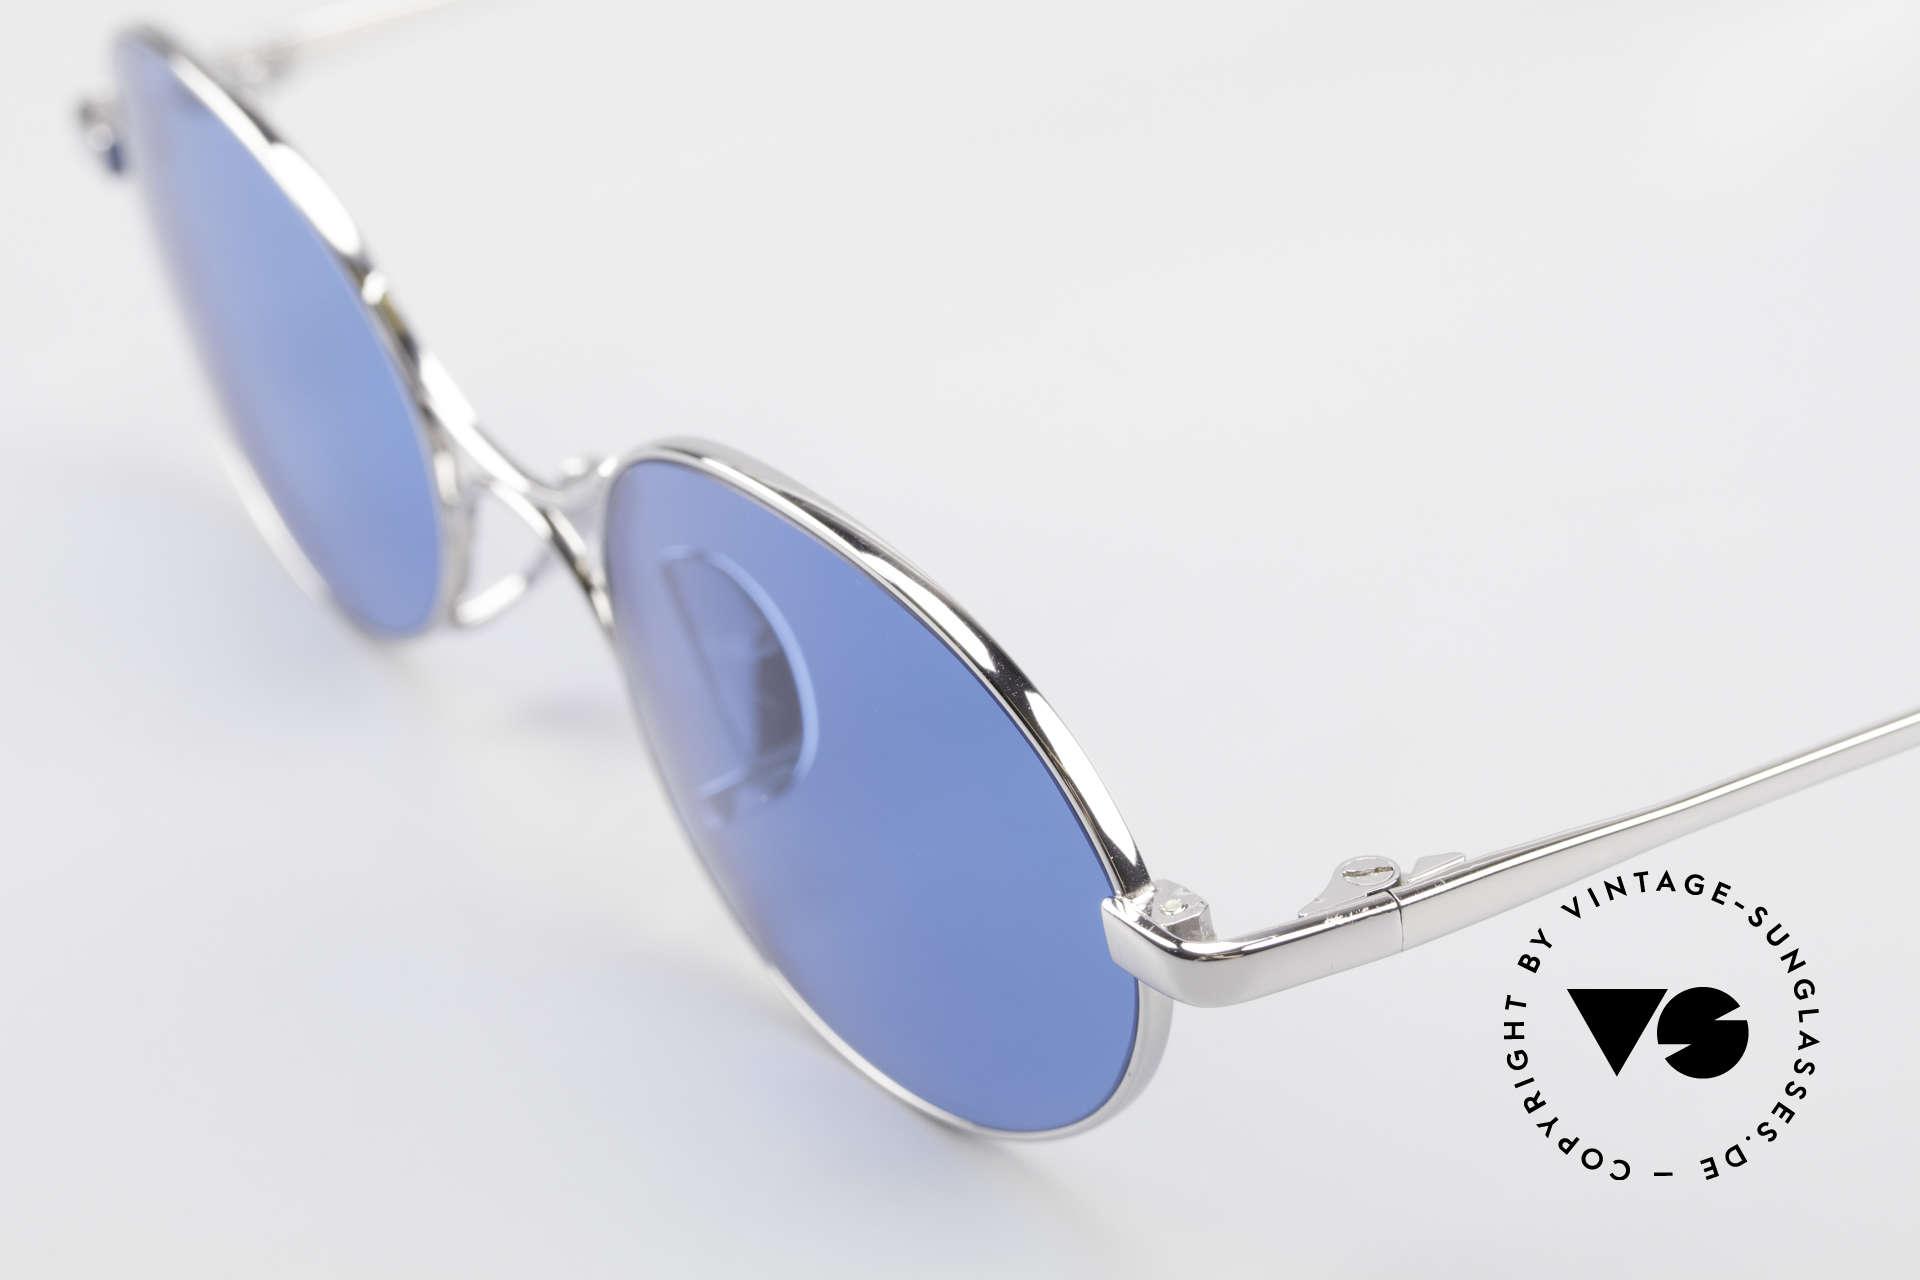 Jean Paul Gaultier 55-0173 Oval JPG Designer Sunglasses, true designer piece in top-notch craftsmanship, Made for Men and Women